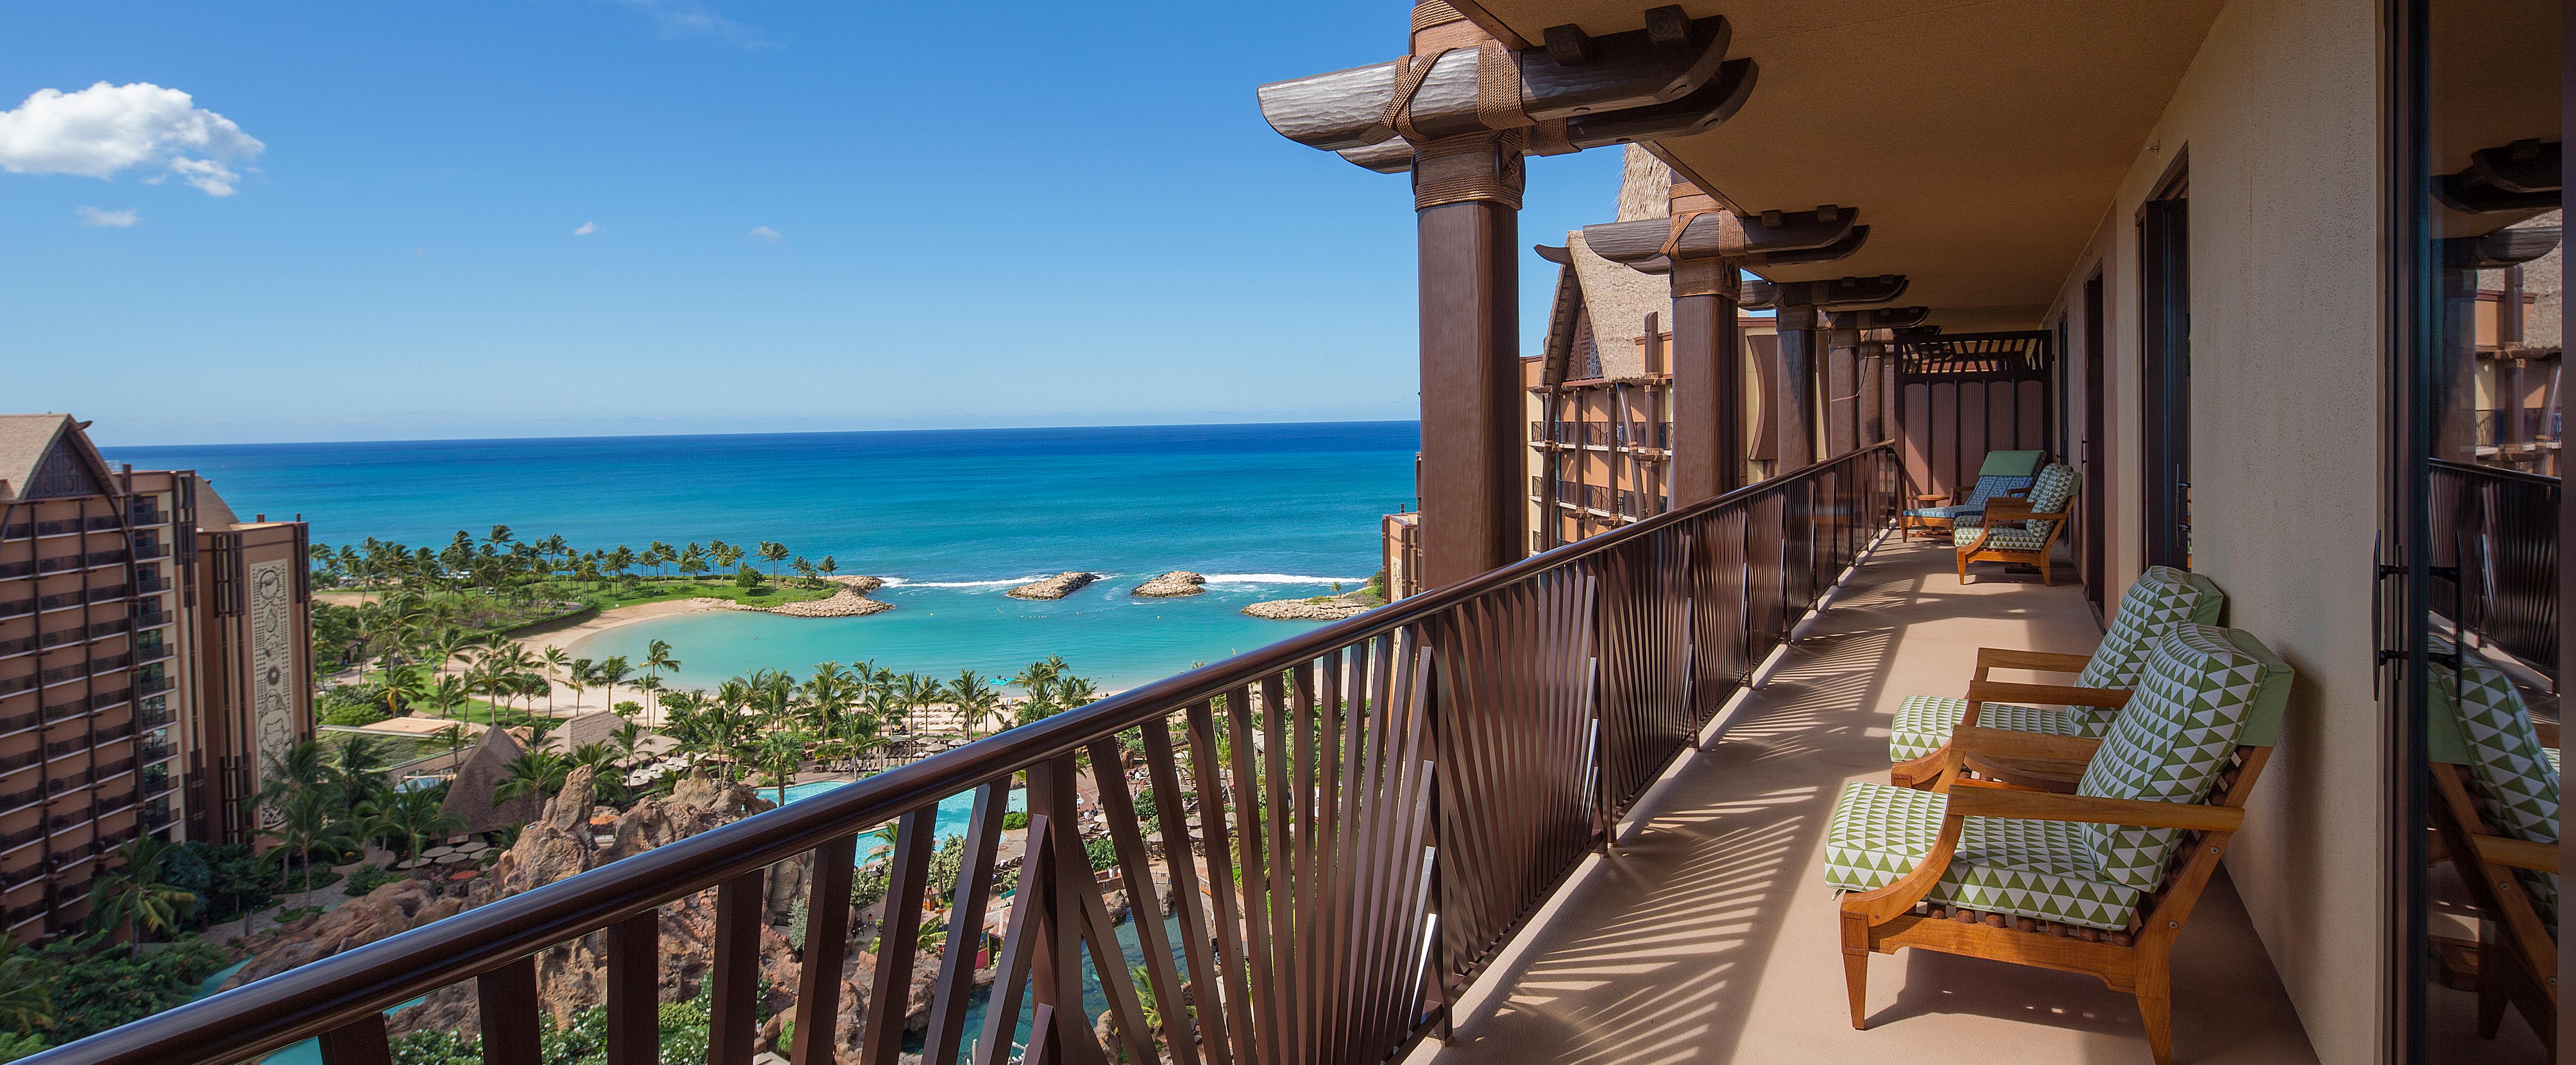 A balcony overlooking the Aulani beach